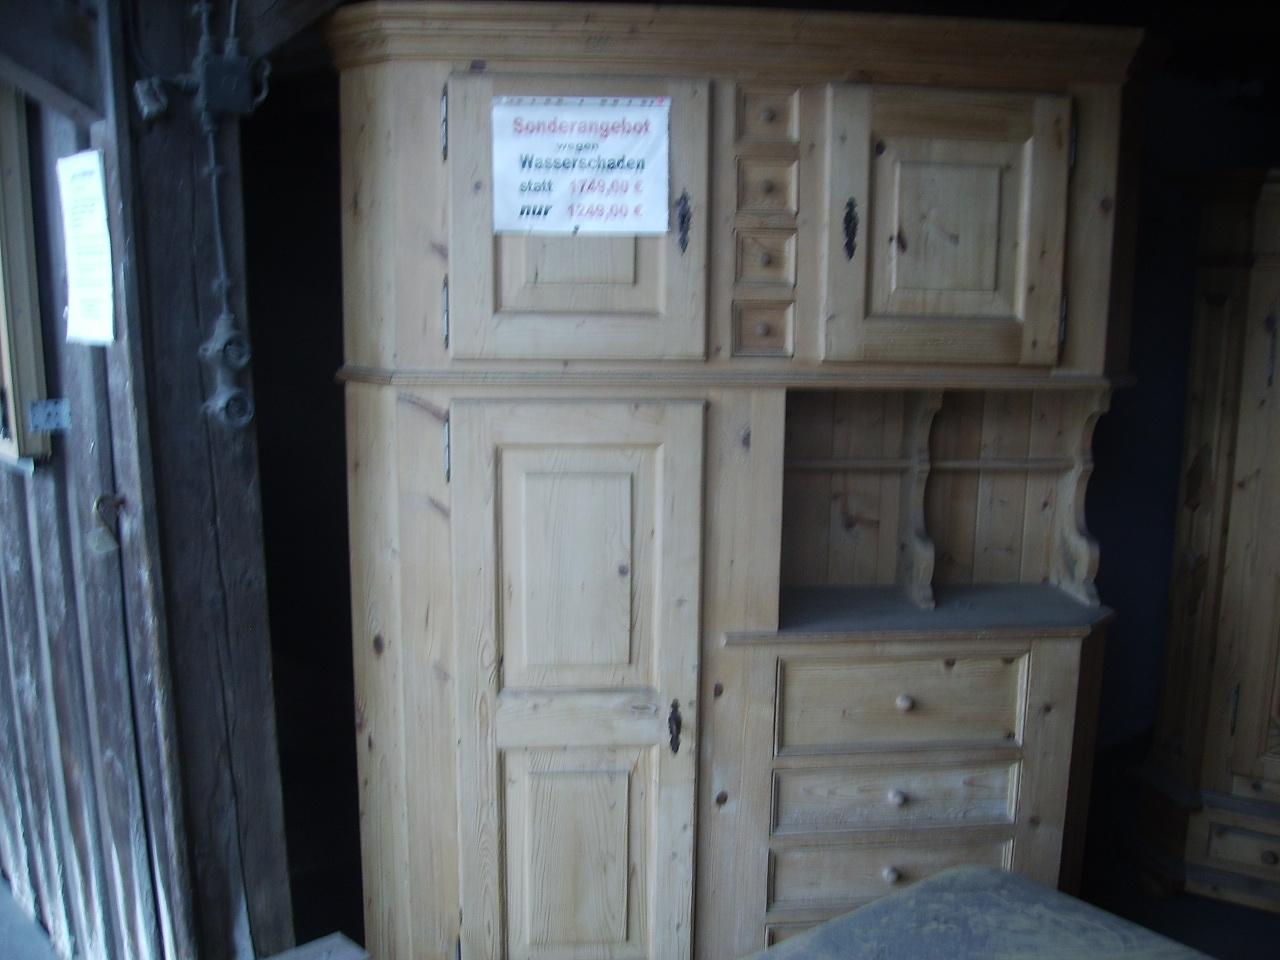 kuchenschranke aus holz : Kuechenschraenke Aus Holz In Geraeumiger 51c1a4fc880d4 Jpg Pictures to ...